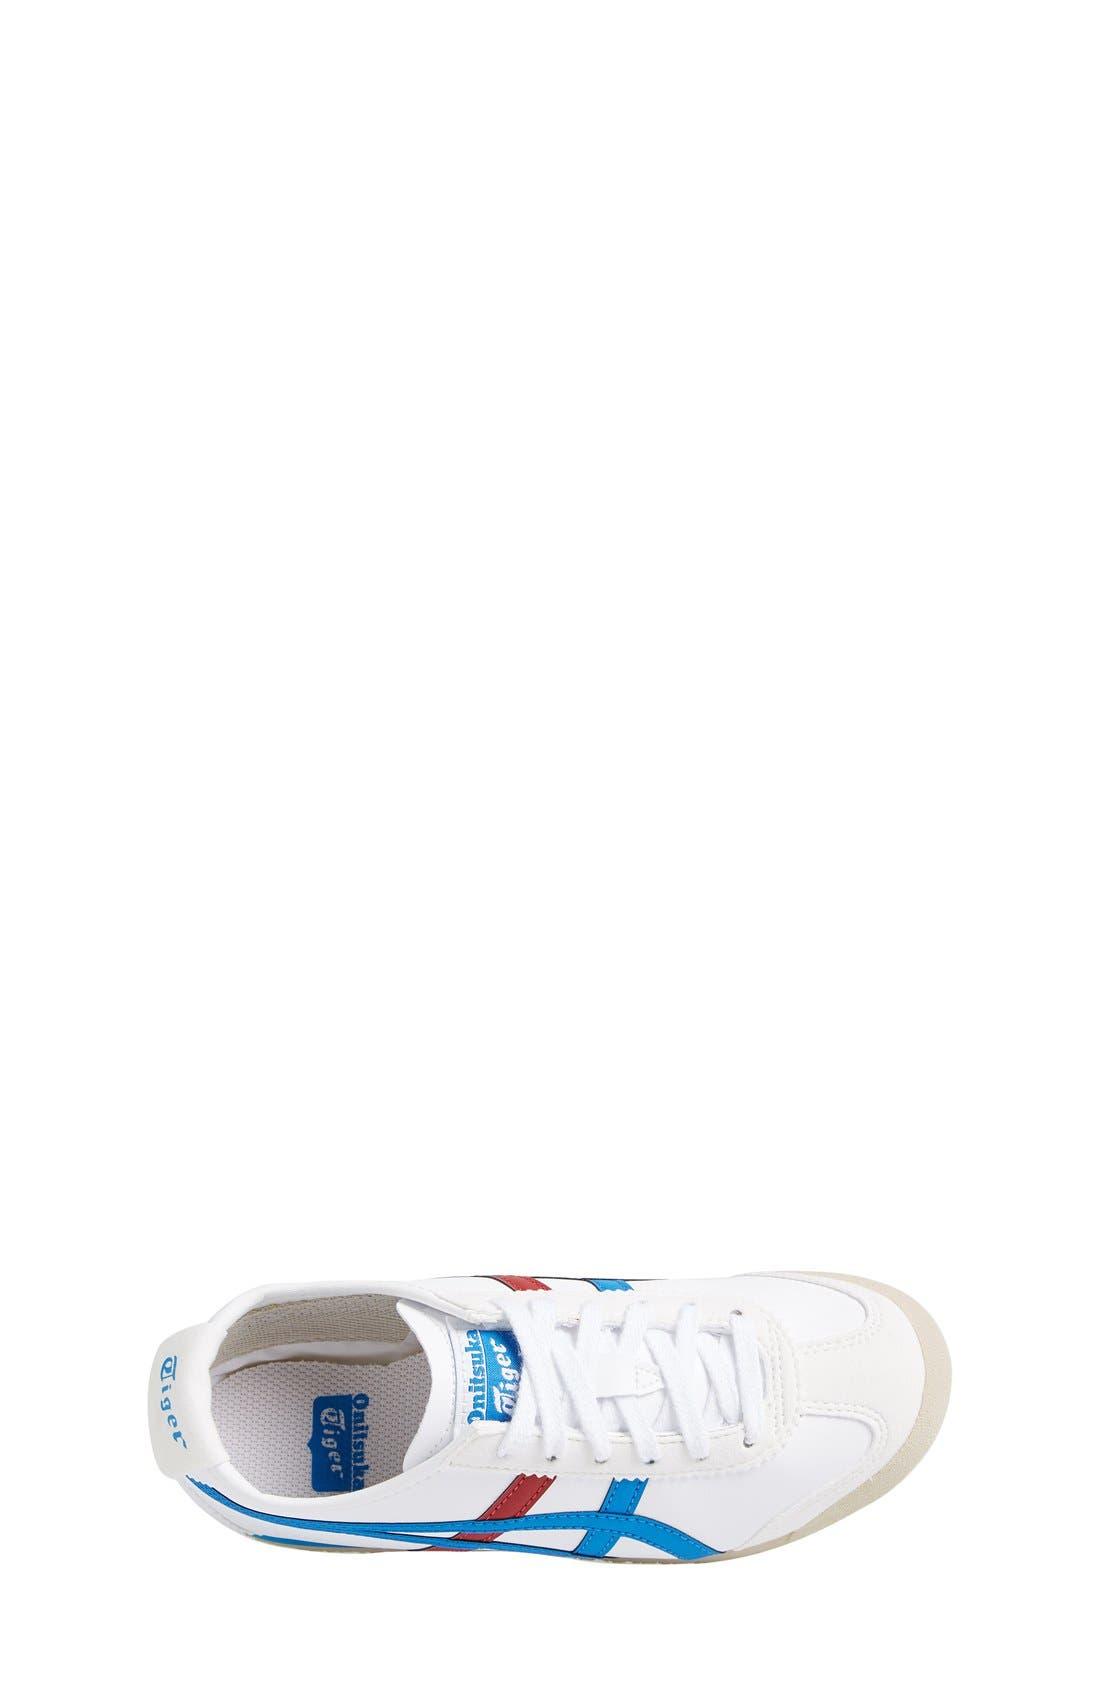 Alternate Image 4  - Onitsuka Tiger™ 'Mexico 66 Baja' Sneaker (Toddler, Little Kid & Big Kid)